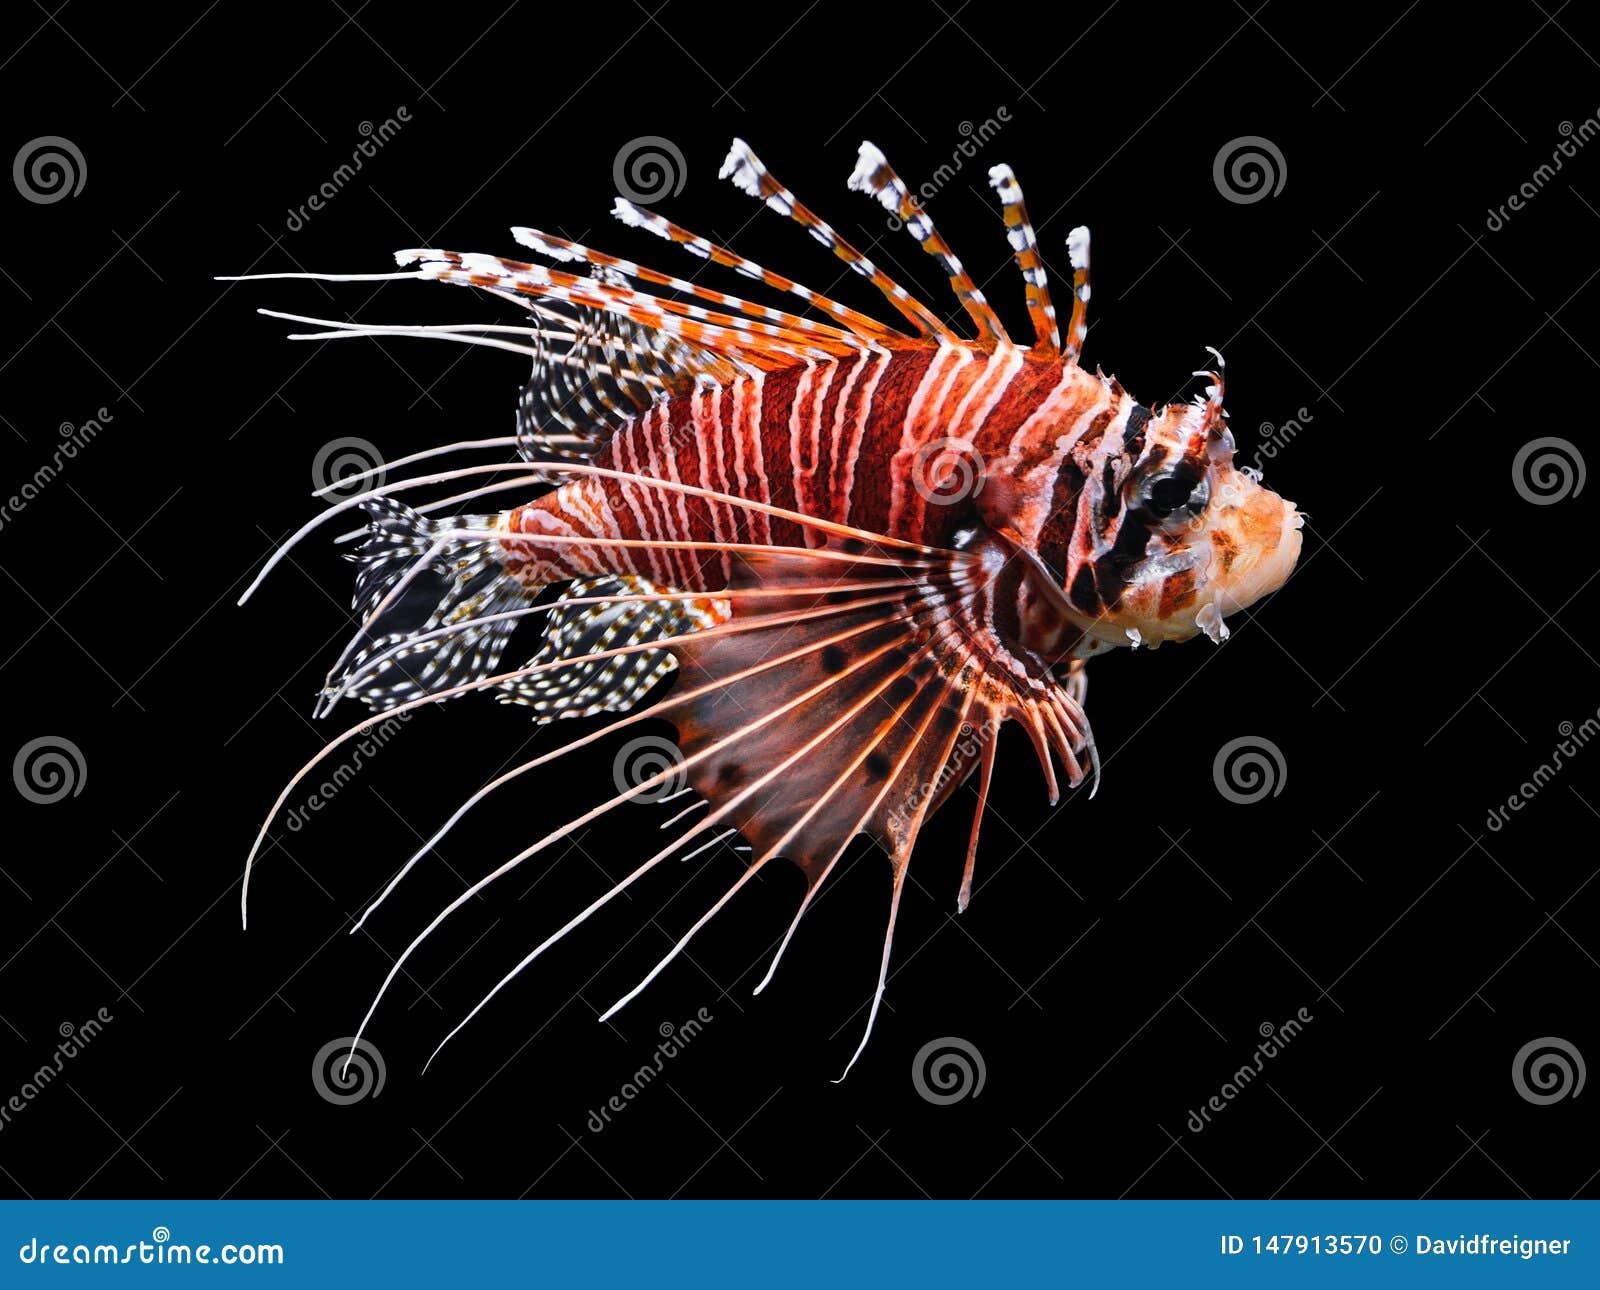 Beautiful swimming Lionfish isolated on black background